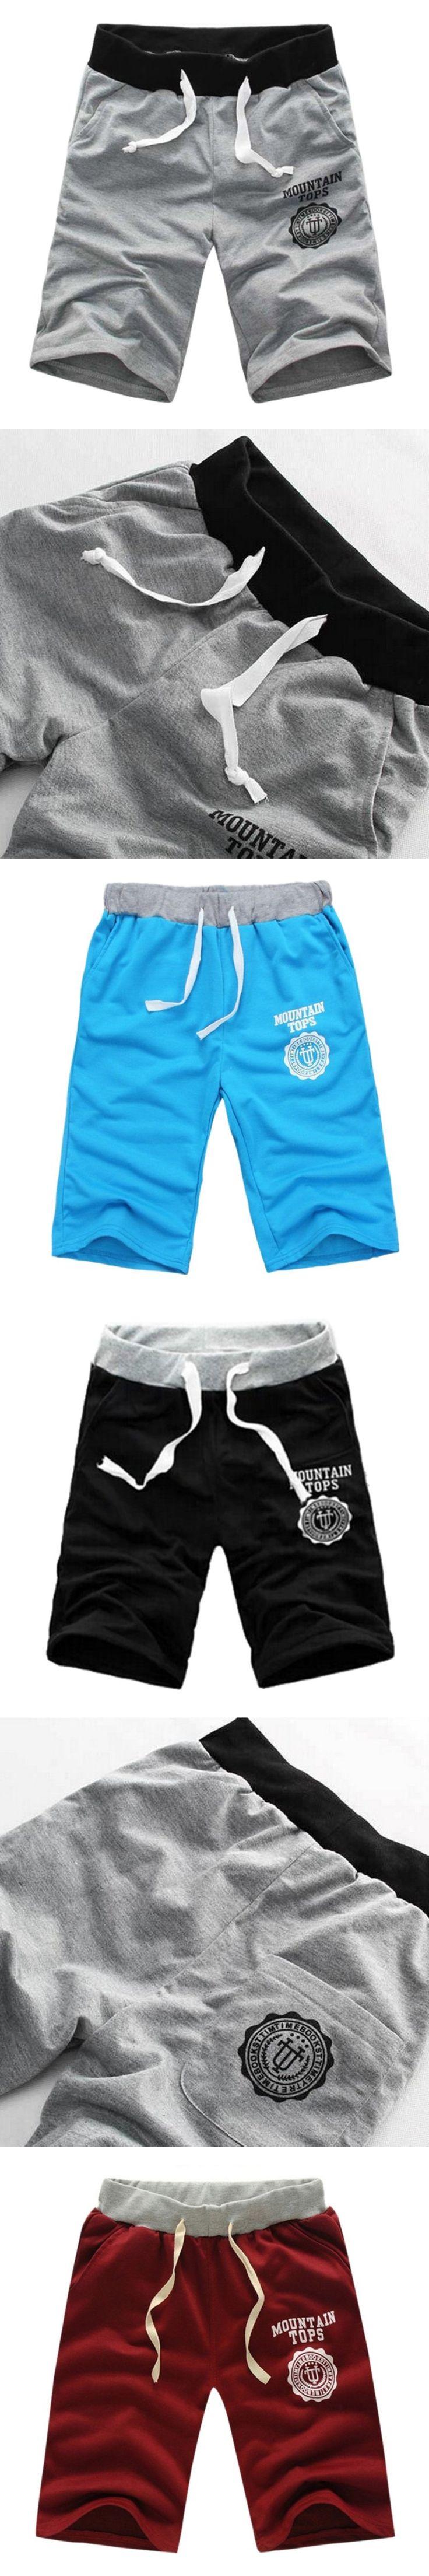 New Bermudas Masculina Marca Shorts men beach Short board Male Workout Shorts Casual Exercise Boardshorts High quality